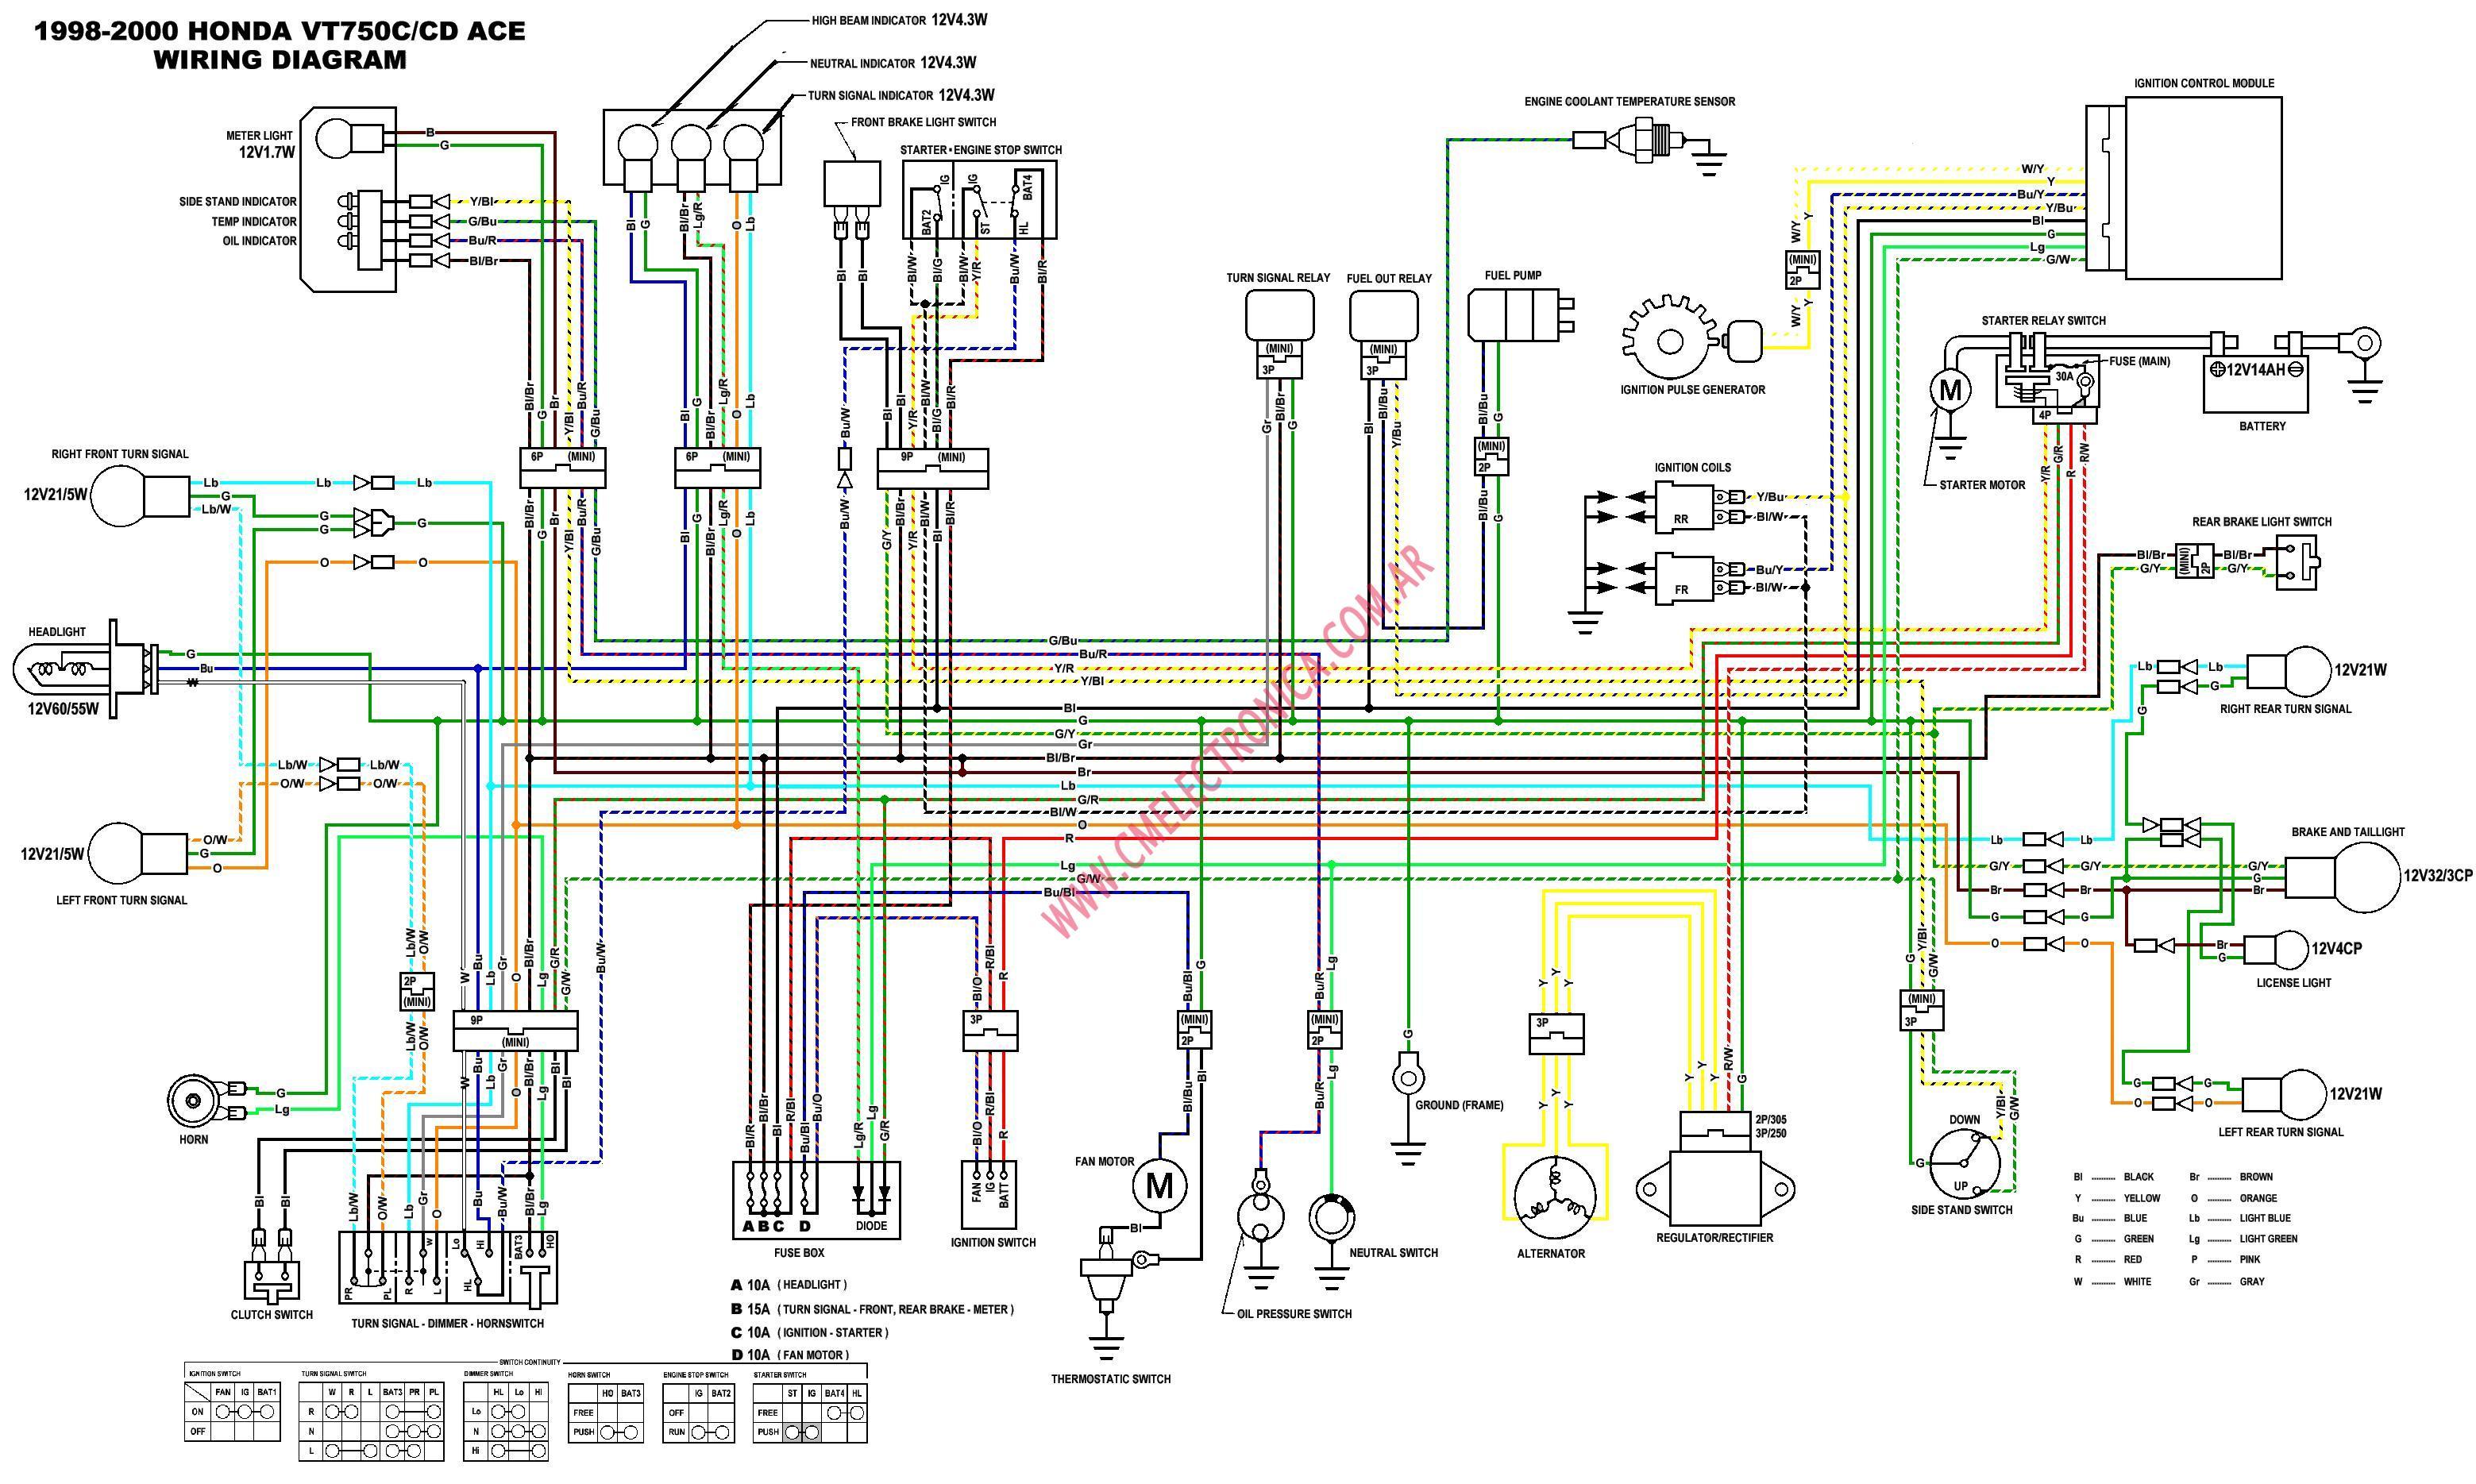 1969 honda cl 70e wiring diagram schematic diagrams Black and White Wiring Diagram honda cl70 wiring wiring schematic honda wiring schematics 1969 honda cl 70e wiring diagram